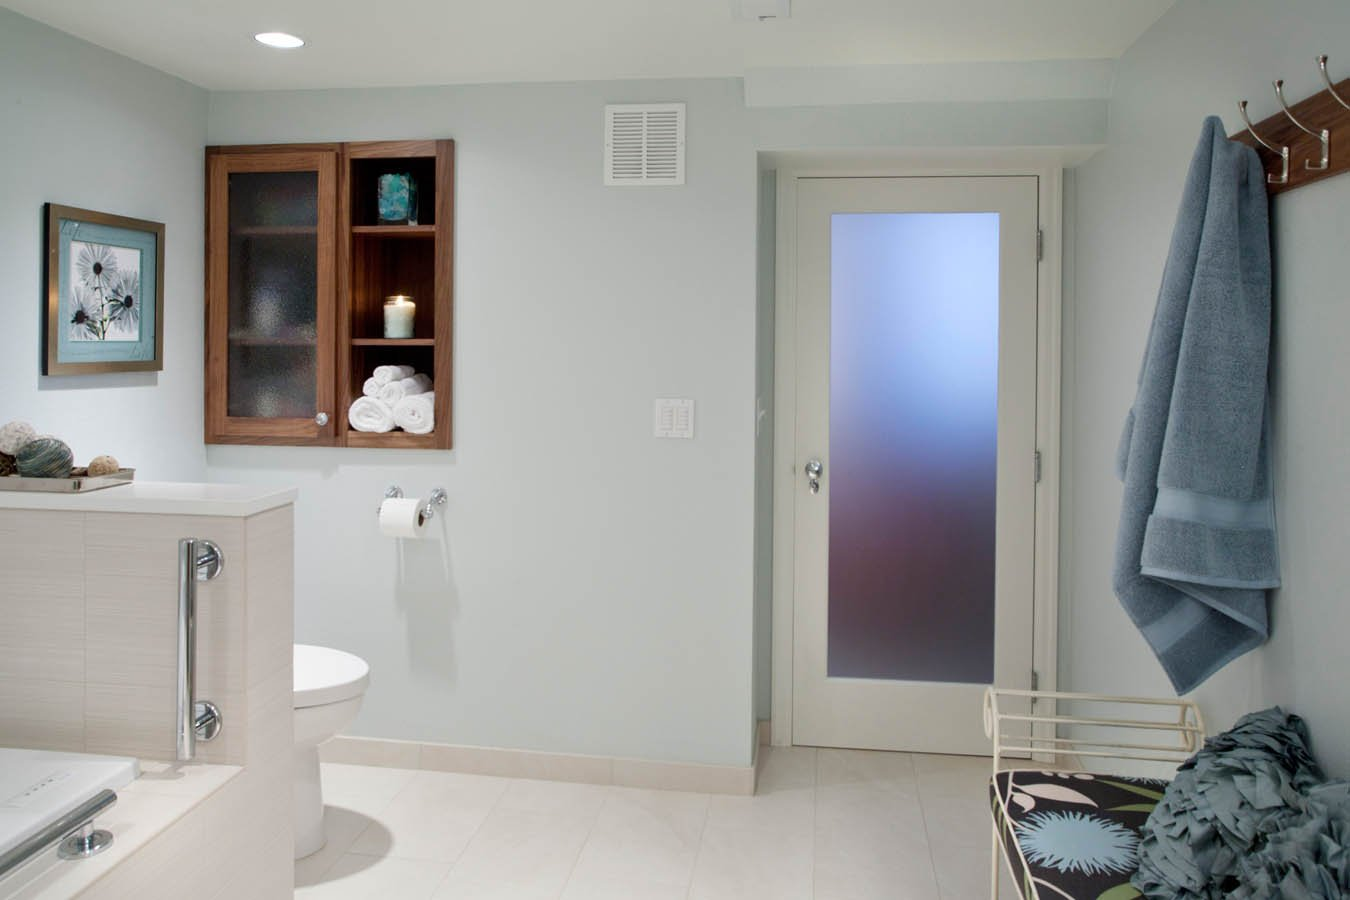 Retro-Transitional bathroom